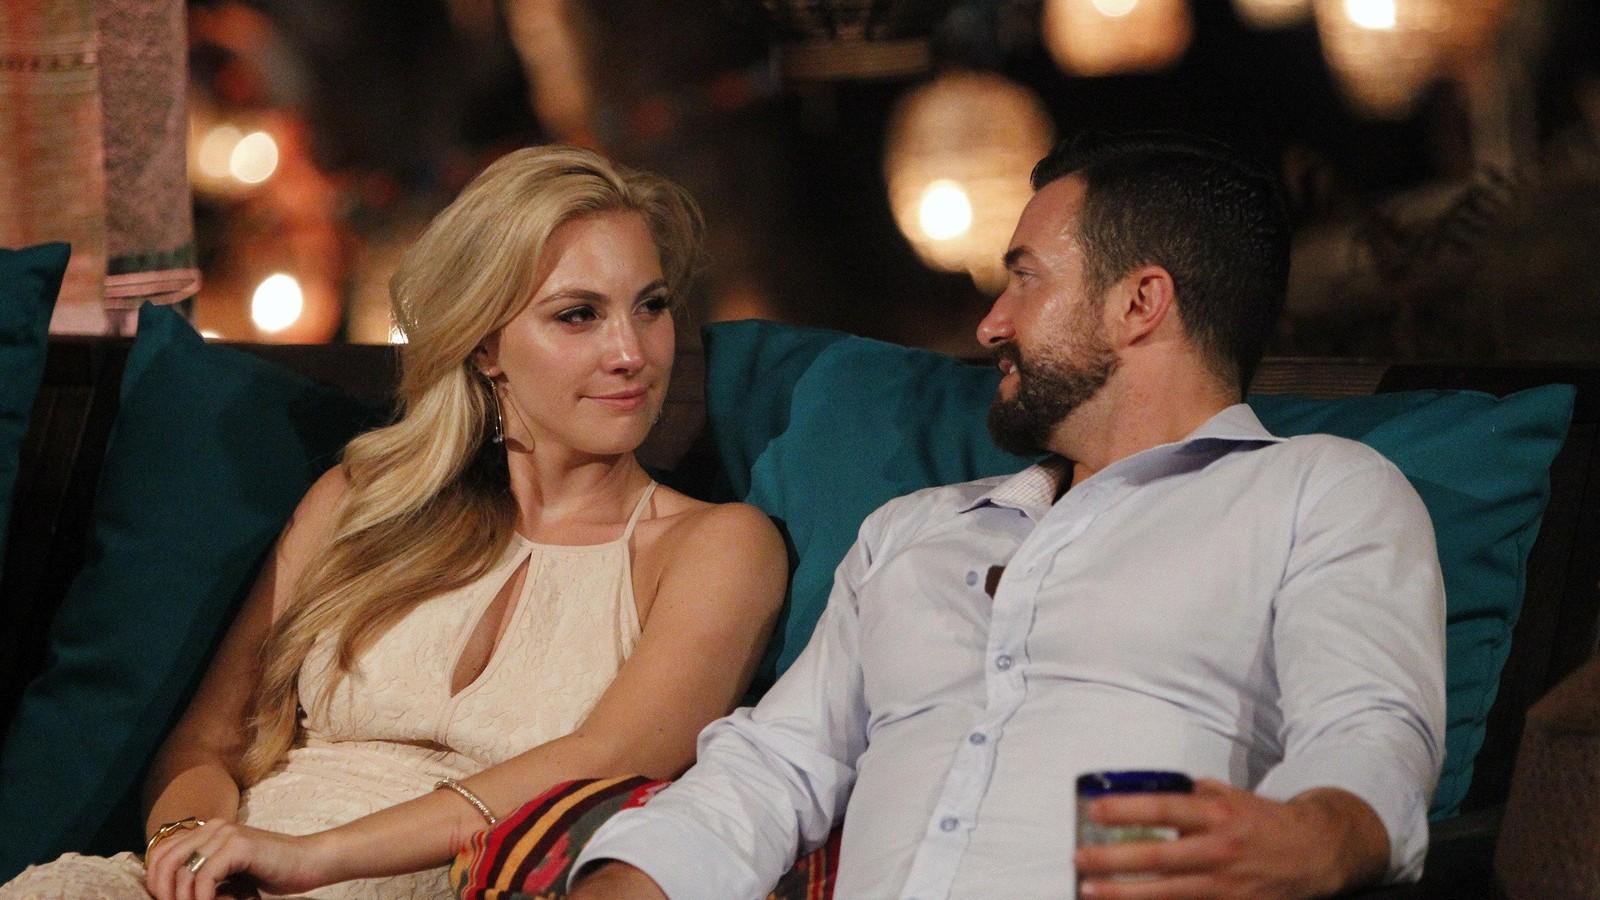 kirk dewindt dating o que significa se želi spojiti